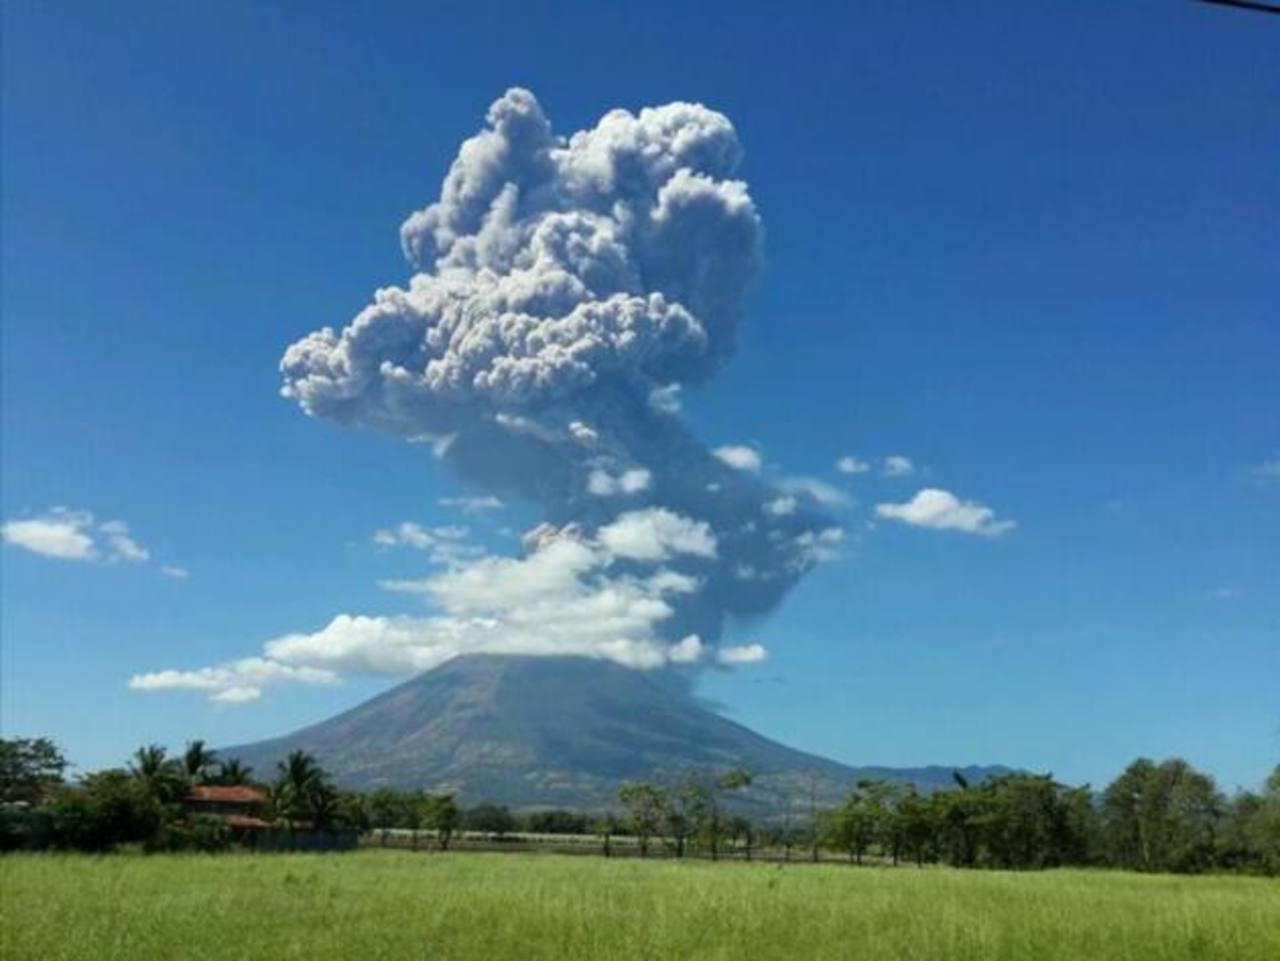 Así se ve el volcán en San Miguel. Foto EDH/@romartinezfranc